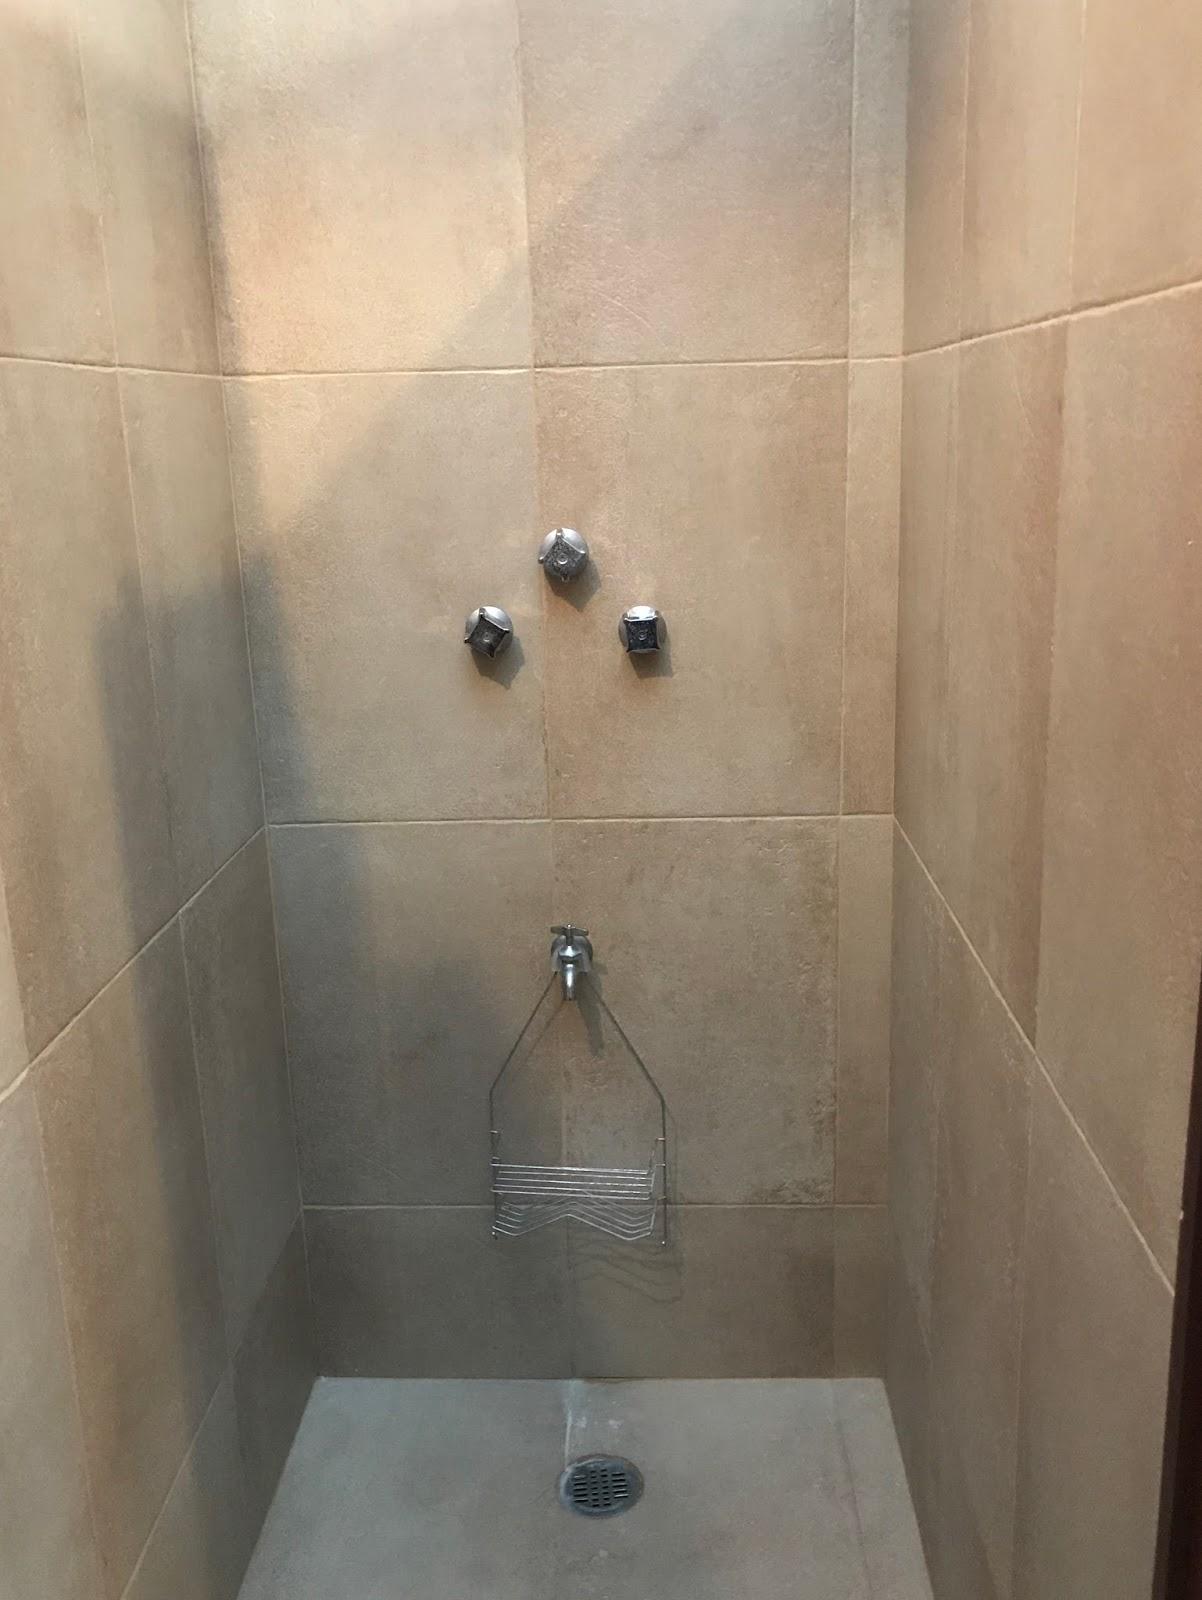 Rock the Kasbah: Hostile Showers